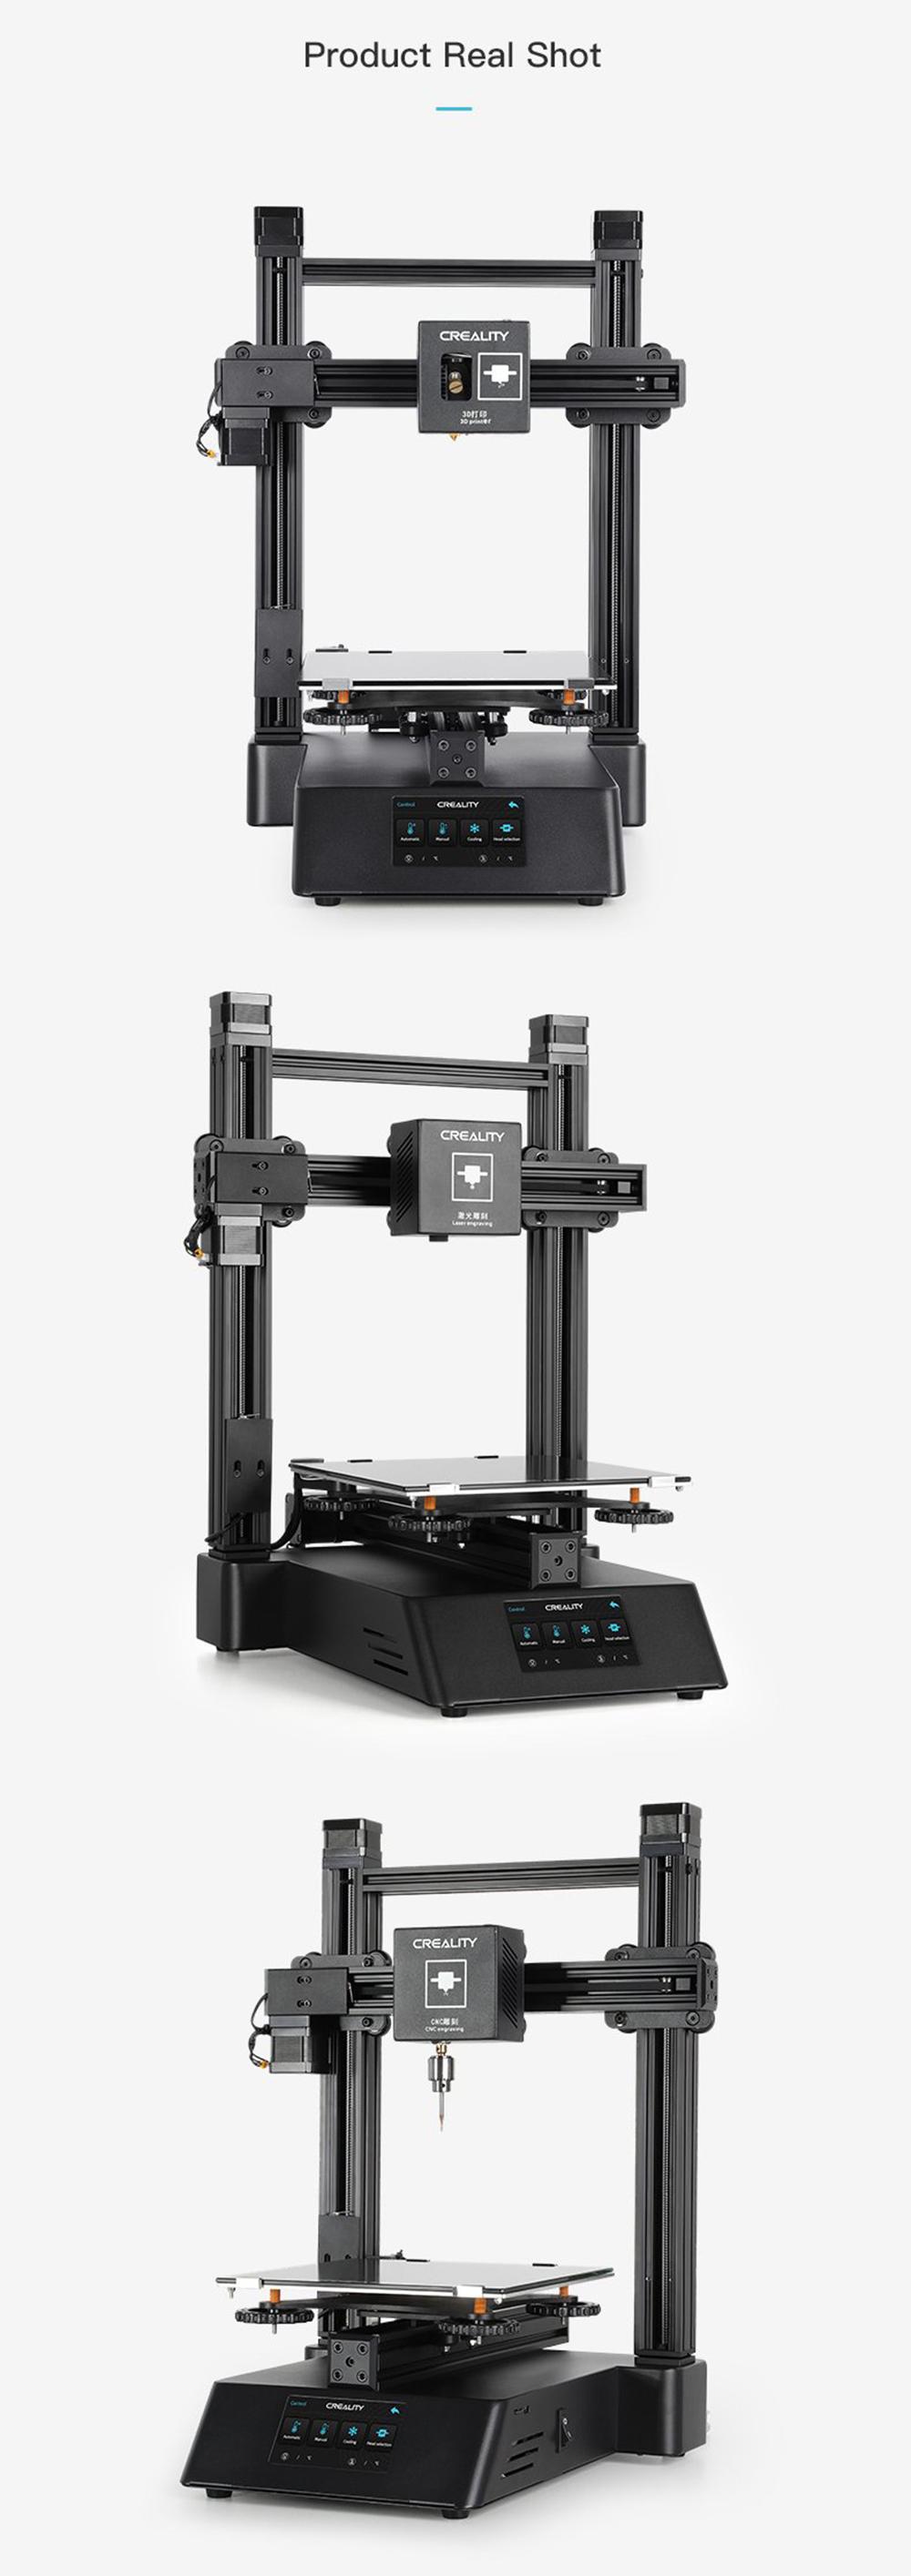 Creality3D CP-01 Multitool 3D-Drucker Bausatz - 200x200x200mm - Verschiedene Ansichten CP-01